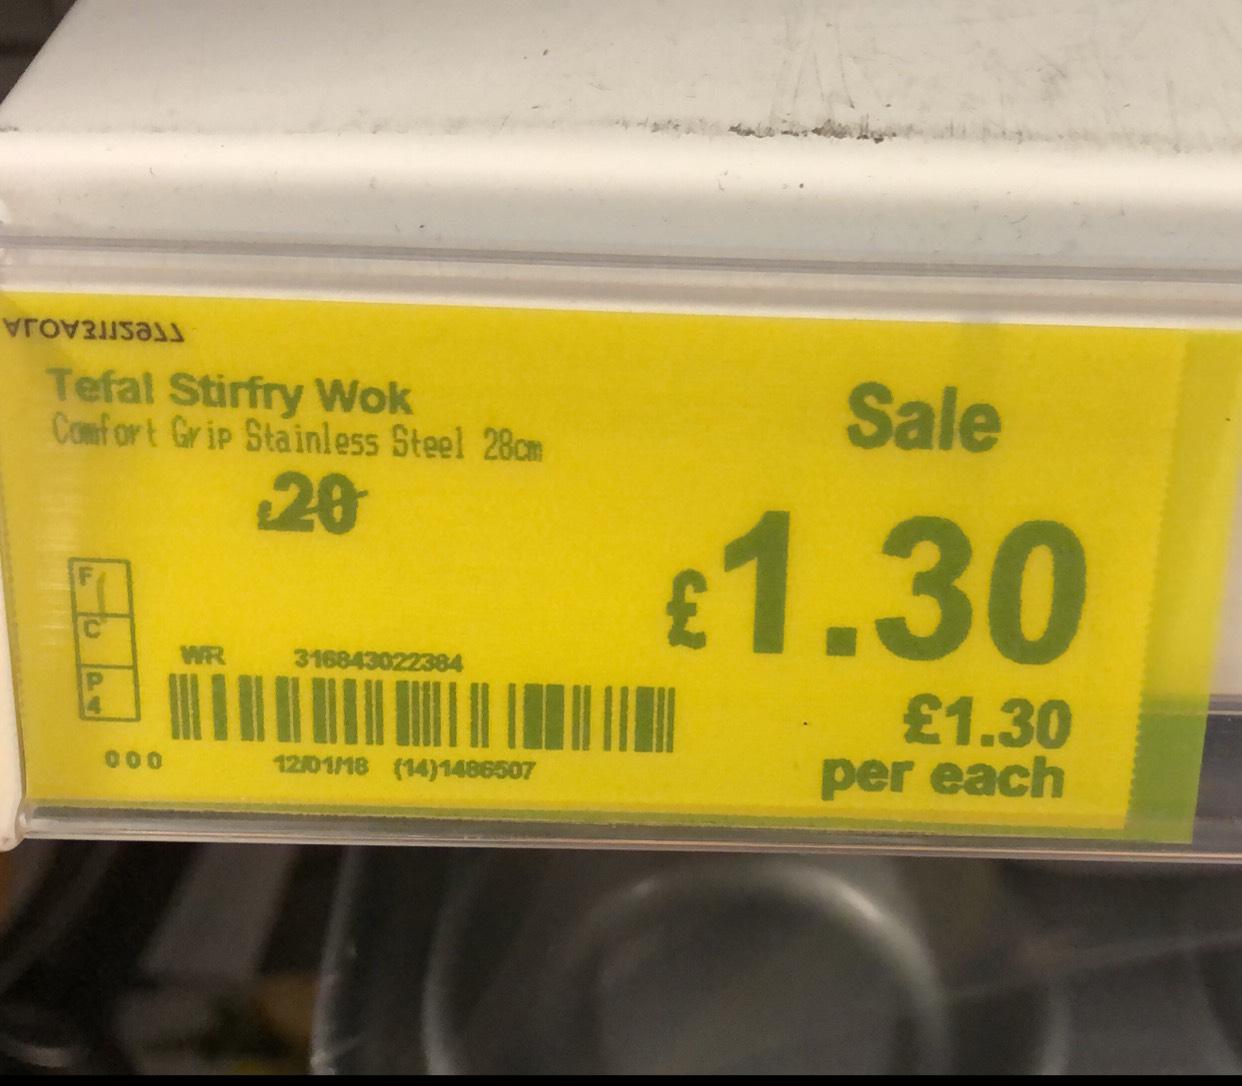 Tefal 28cm Comfort Grip Stainless Steel Wok was £20 now £1.30 instore @ Asda